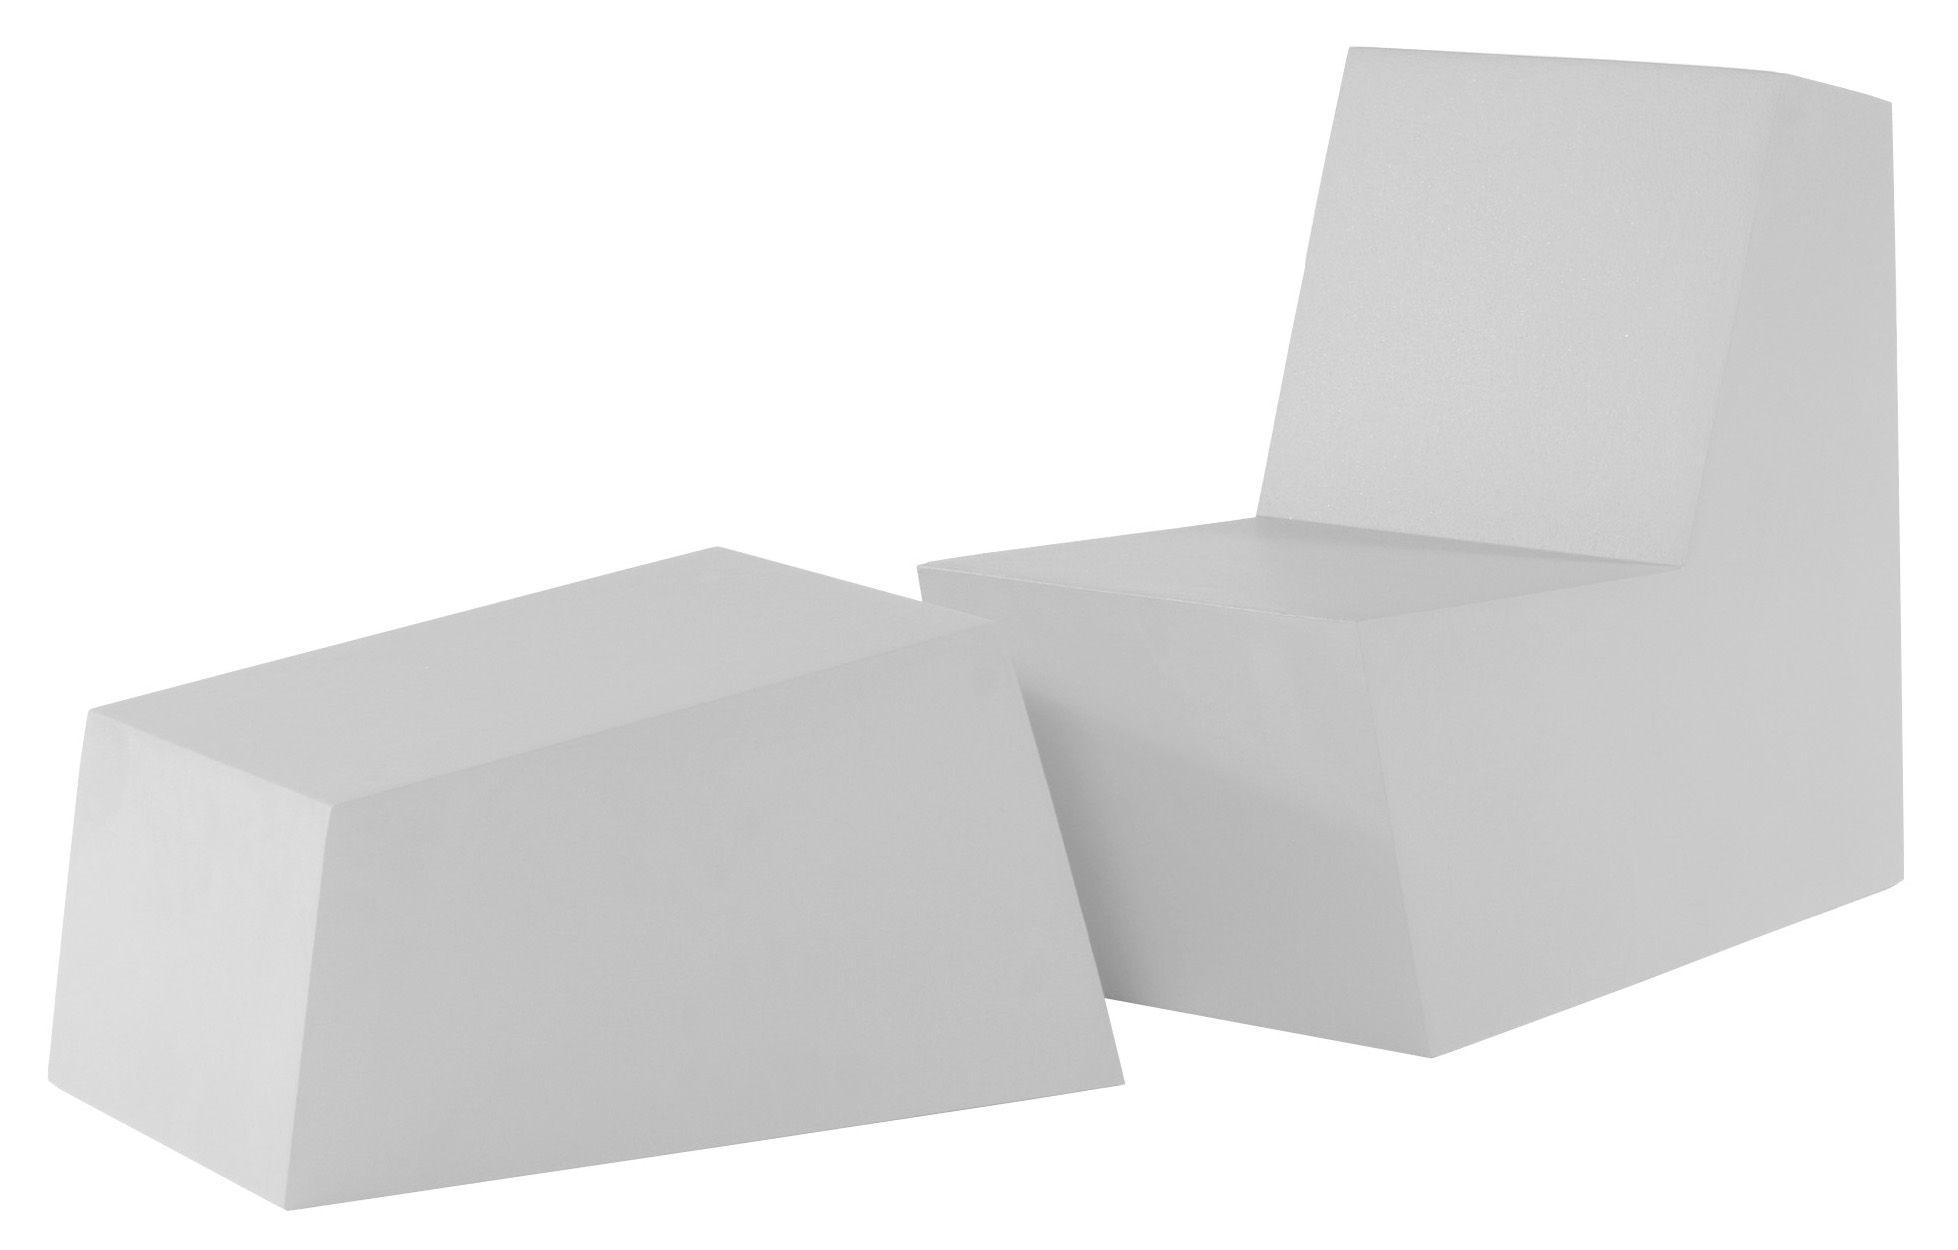 Mobilier - Mobilier Ados - Pouf Primary solo Ottoman - Quinze & Milan - Blanc - Mousse de polyuréthane